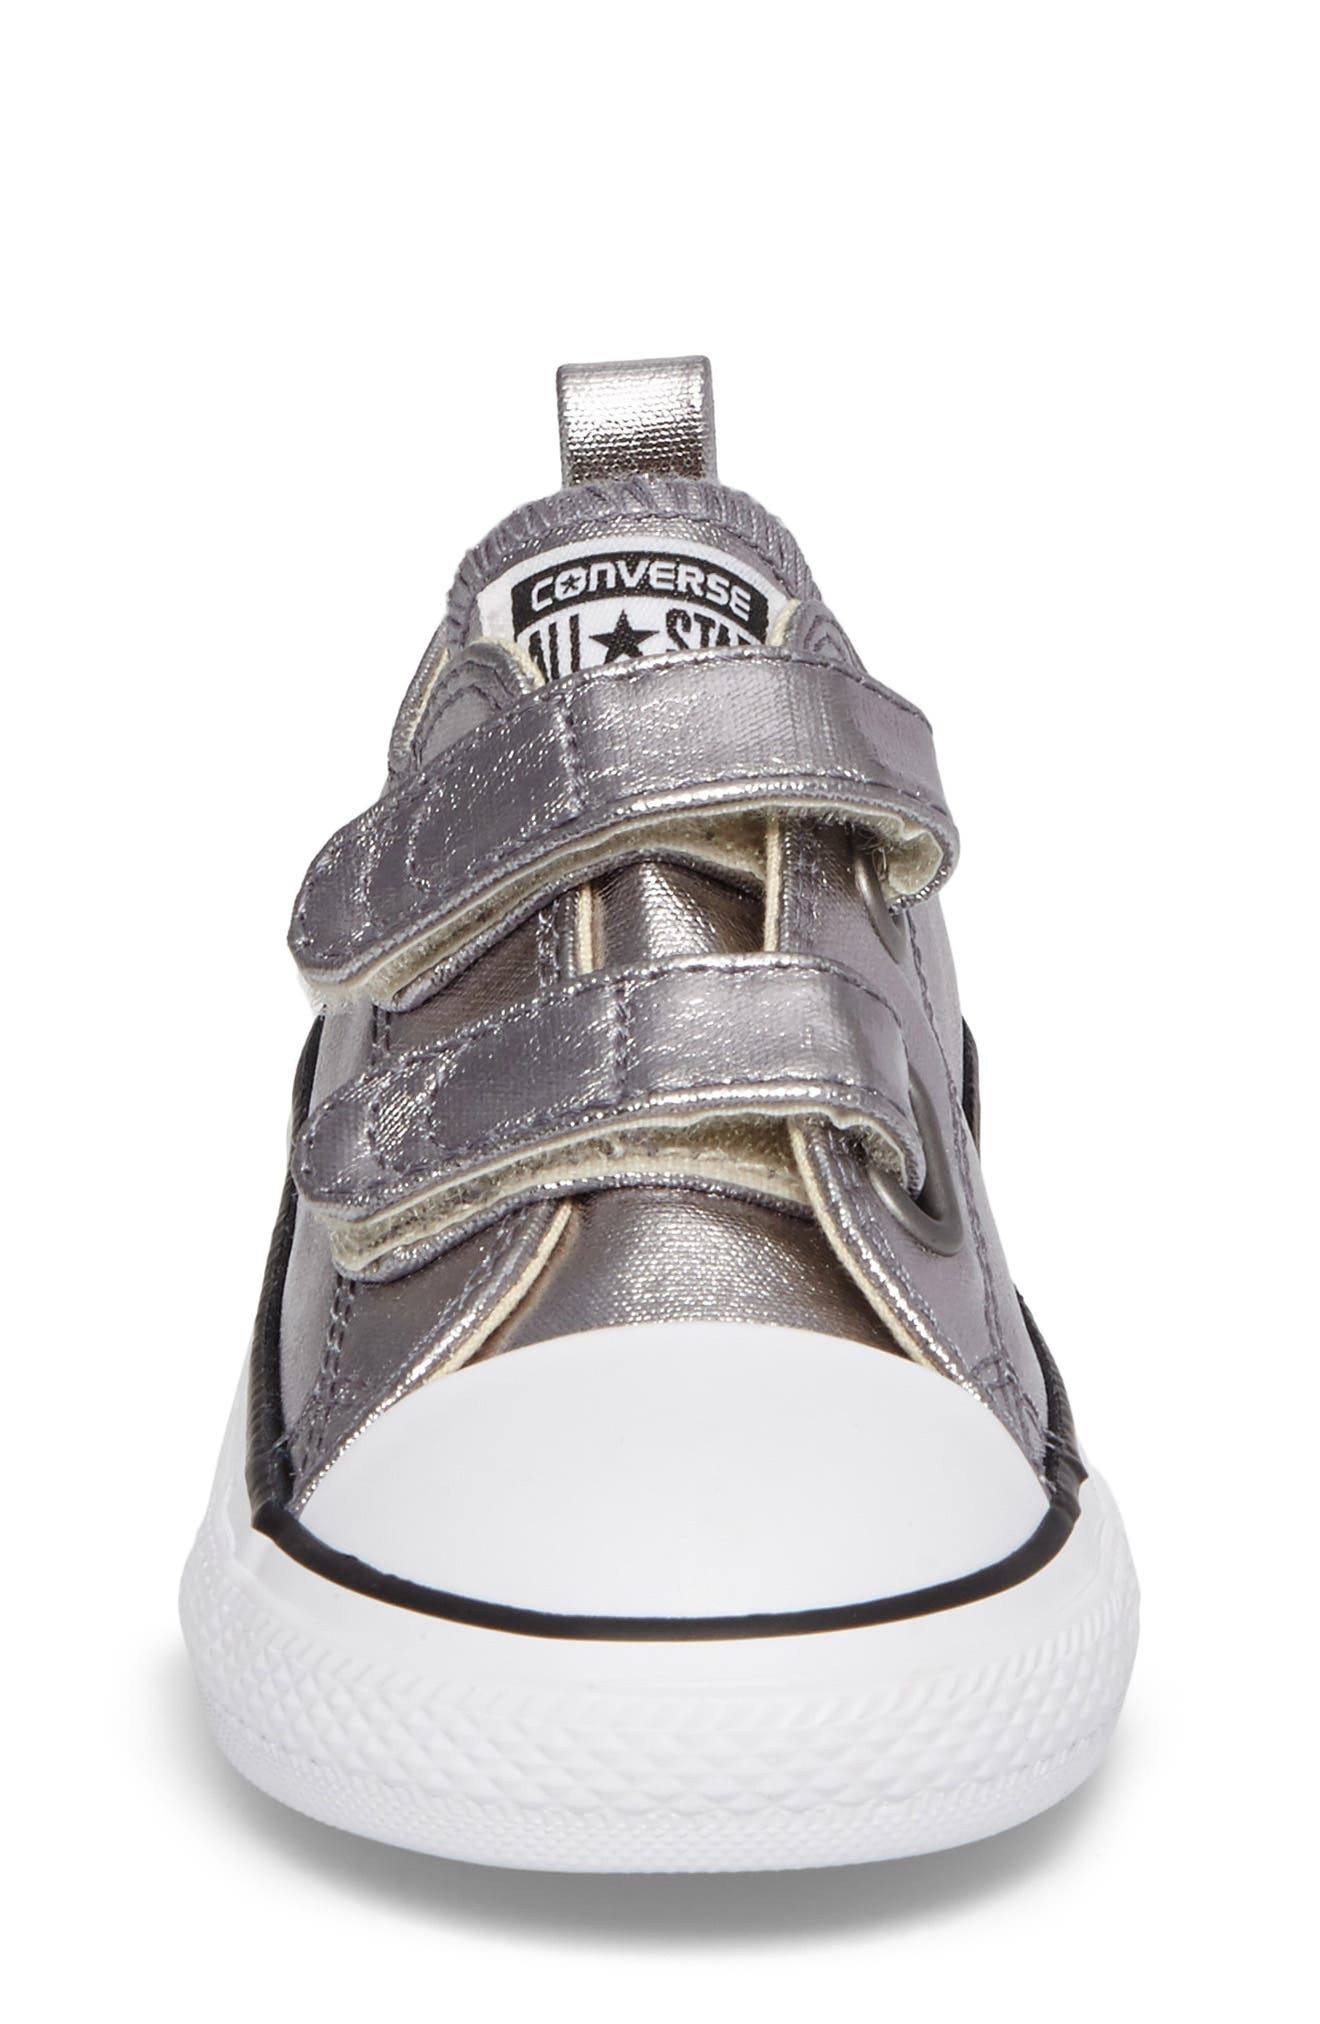 Chuck Taylor<sup>®</sup> All Star<sup>®</sup> Seasonal Metallic Low Top Sneaker,                             Alternate thumbnail 4, color,                             040